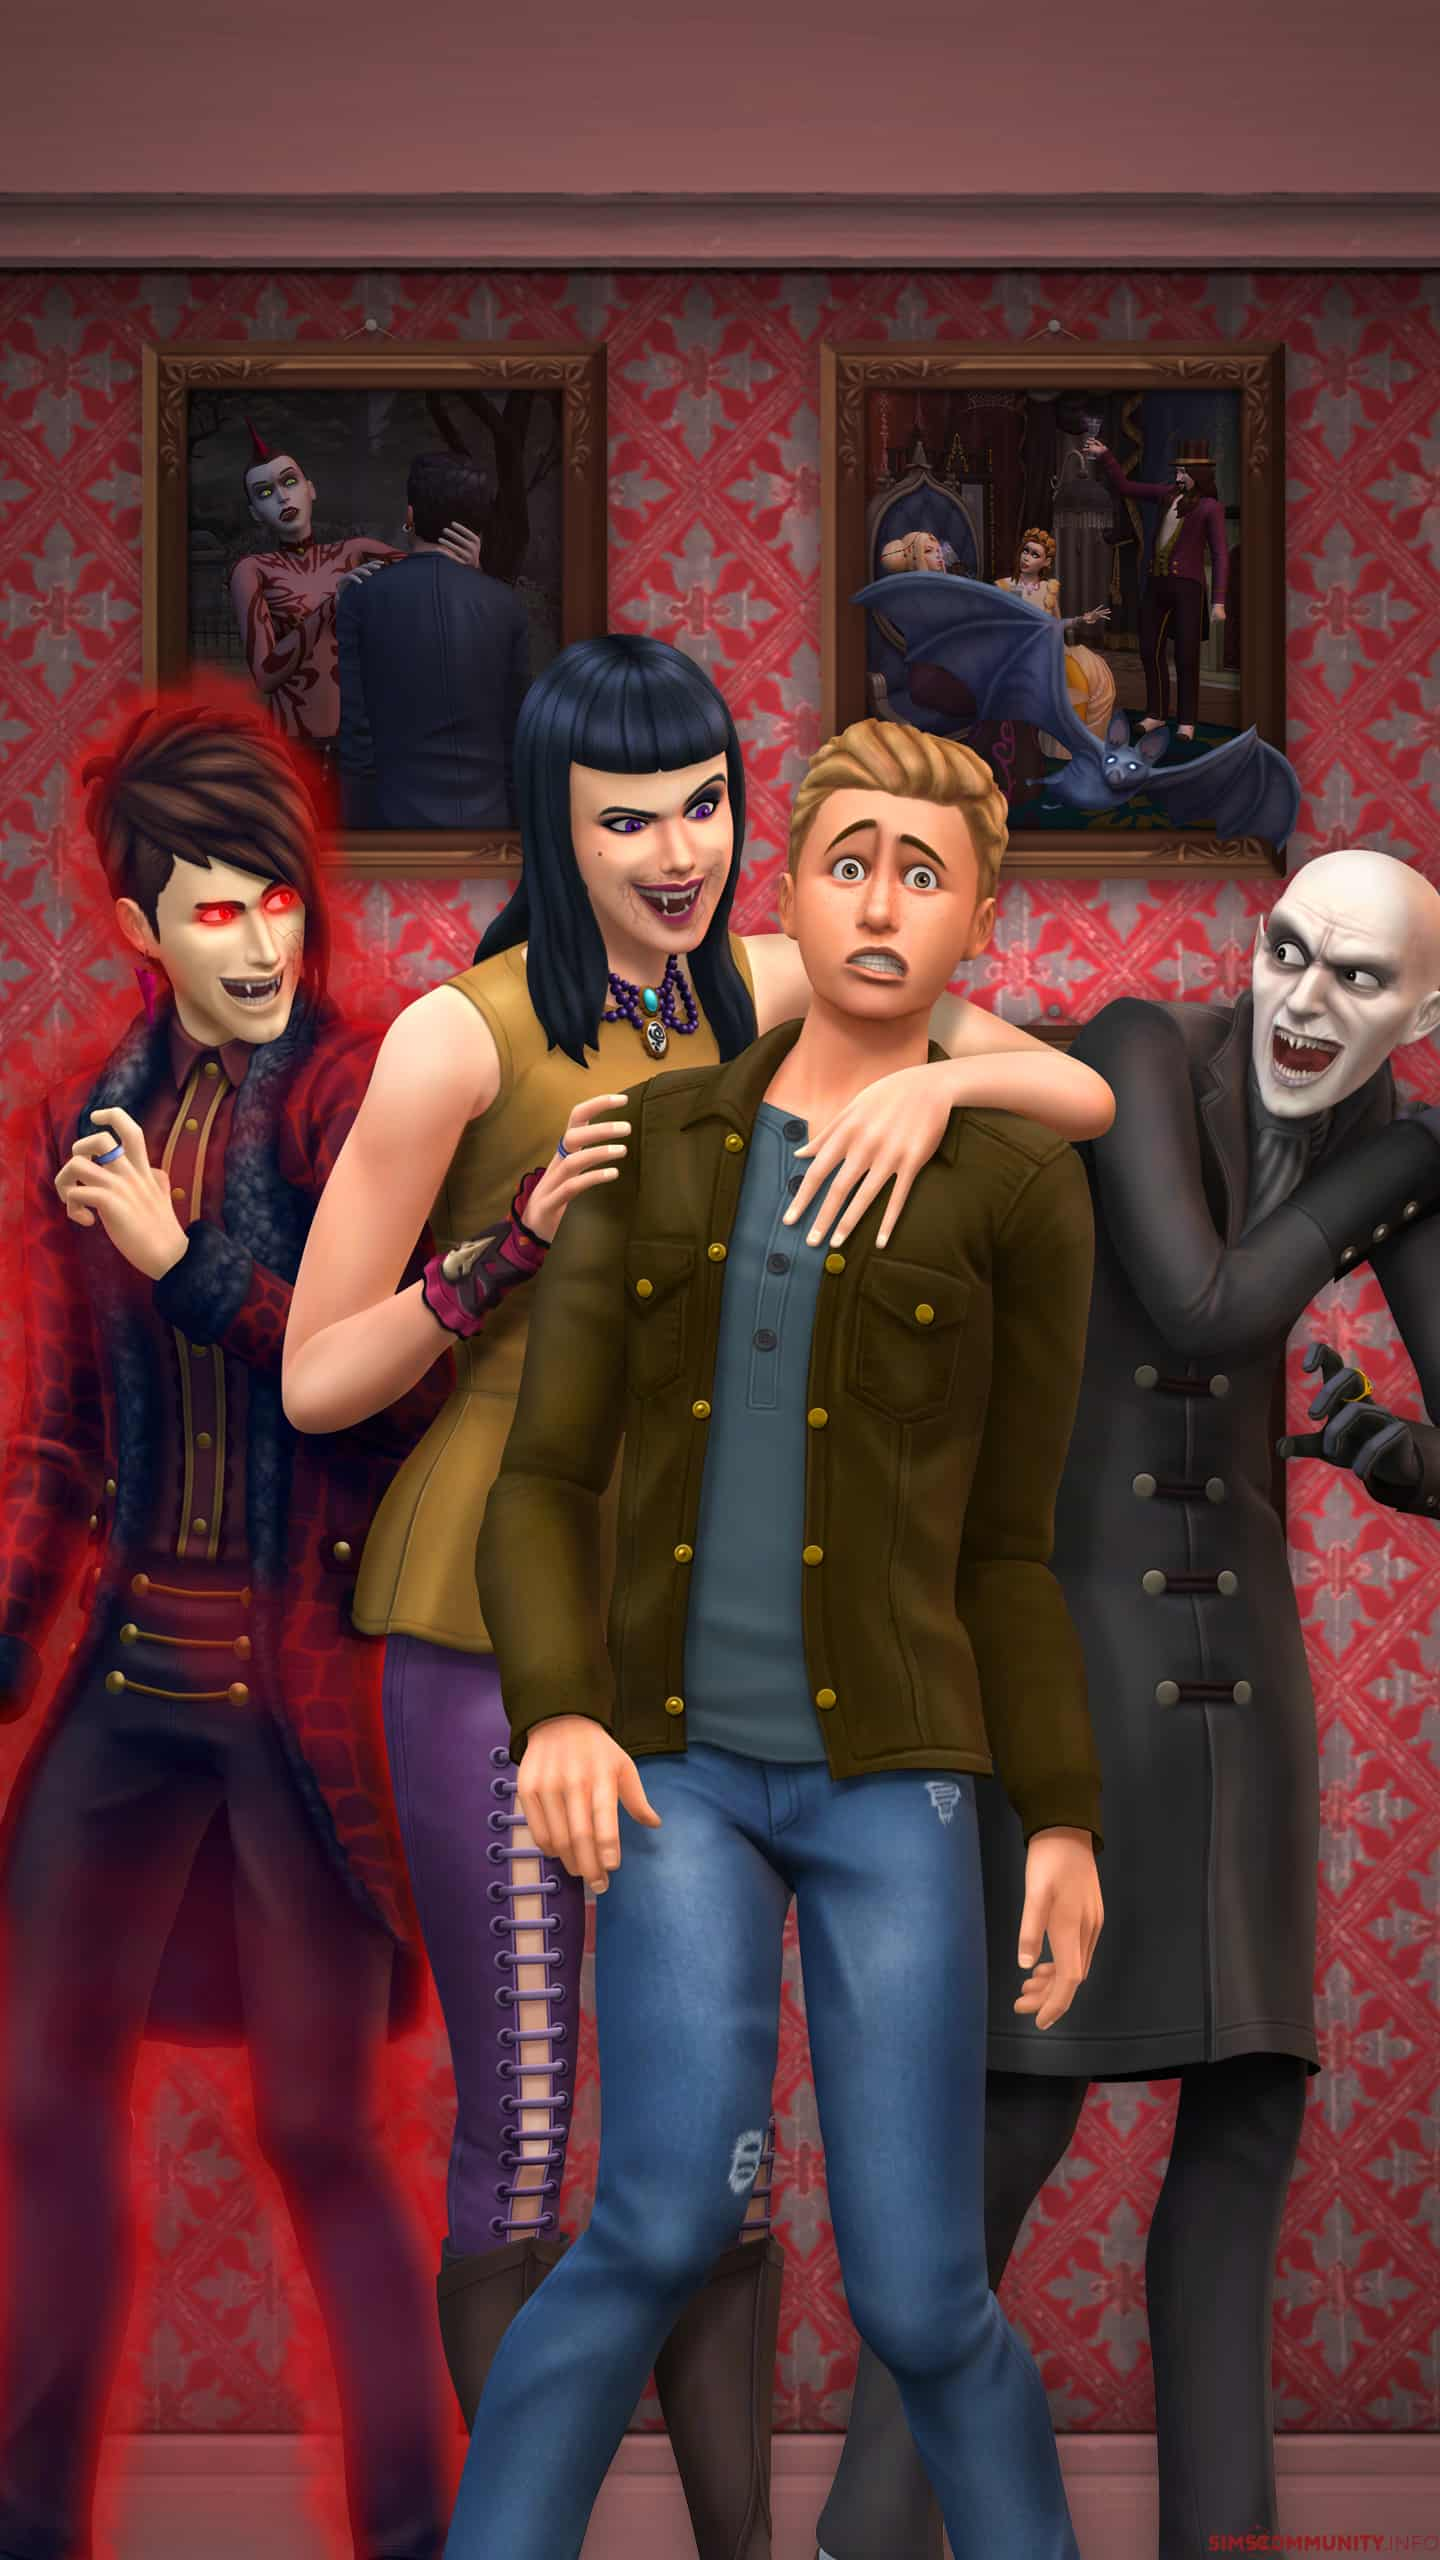 The Sims 4 Vampires: Desktop & Smartphone Wallpapers